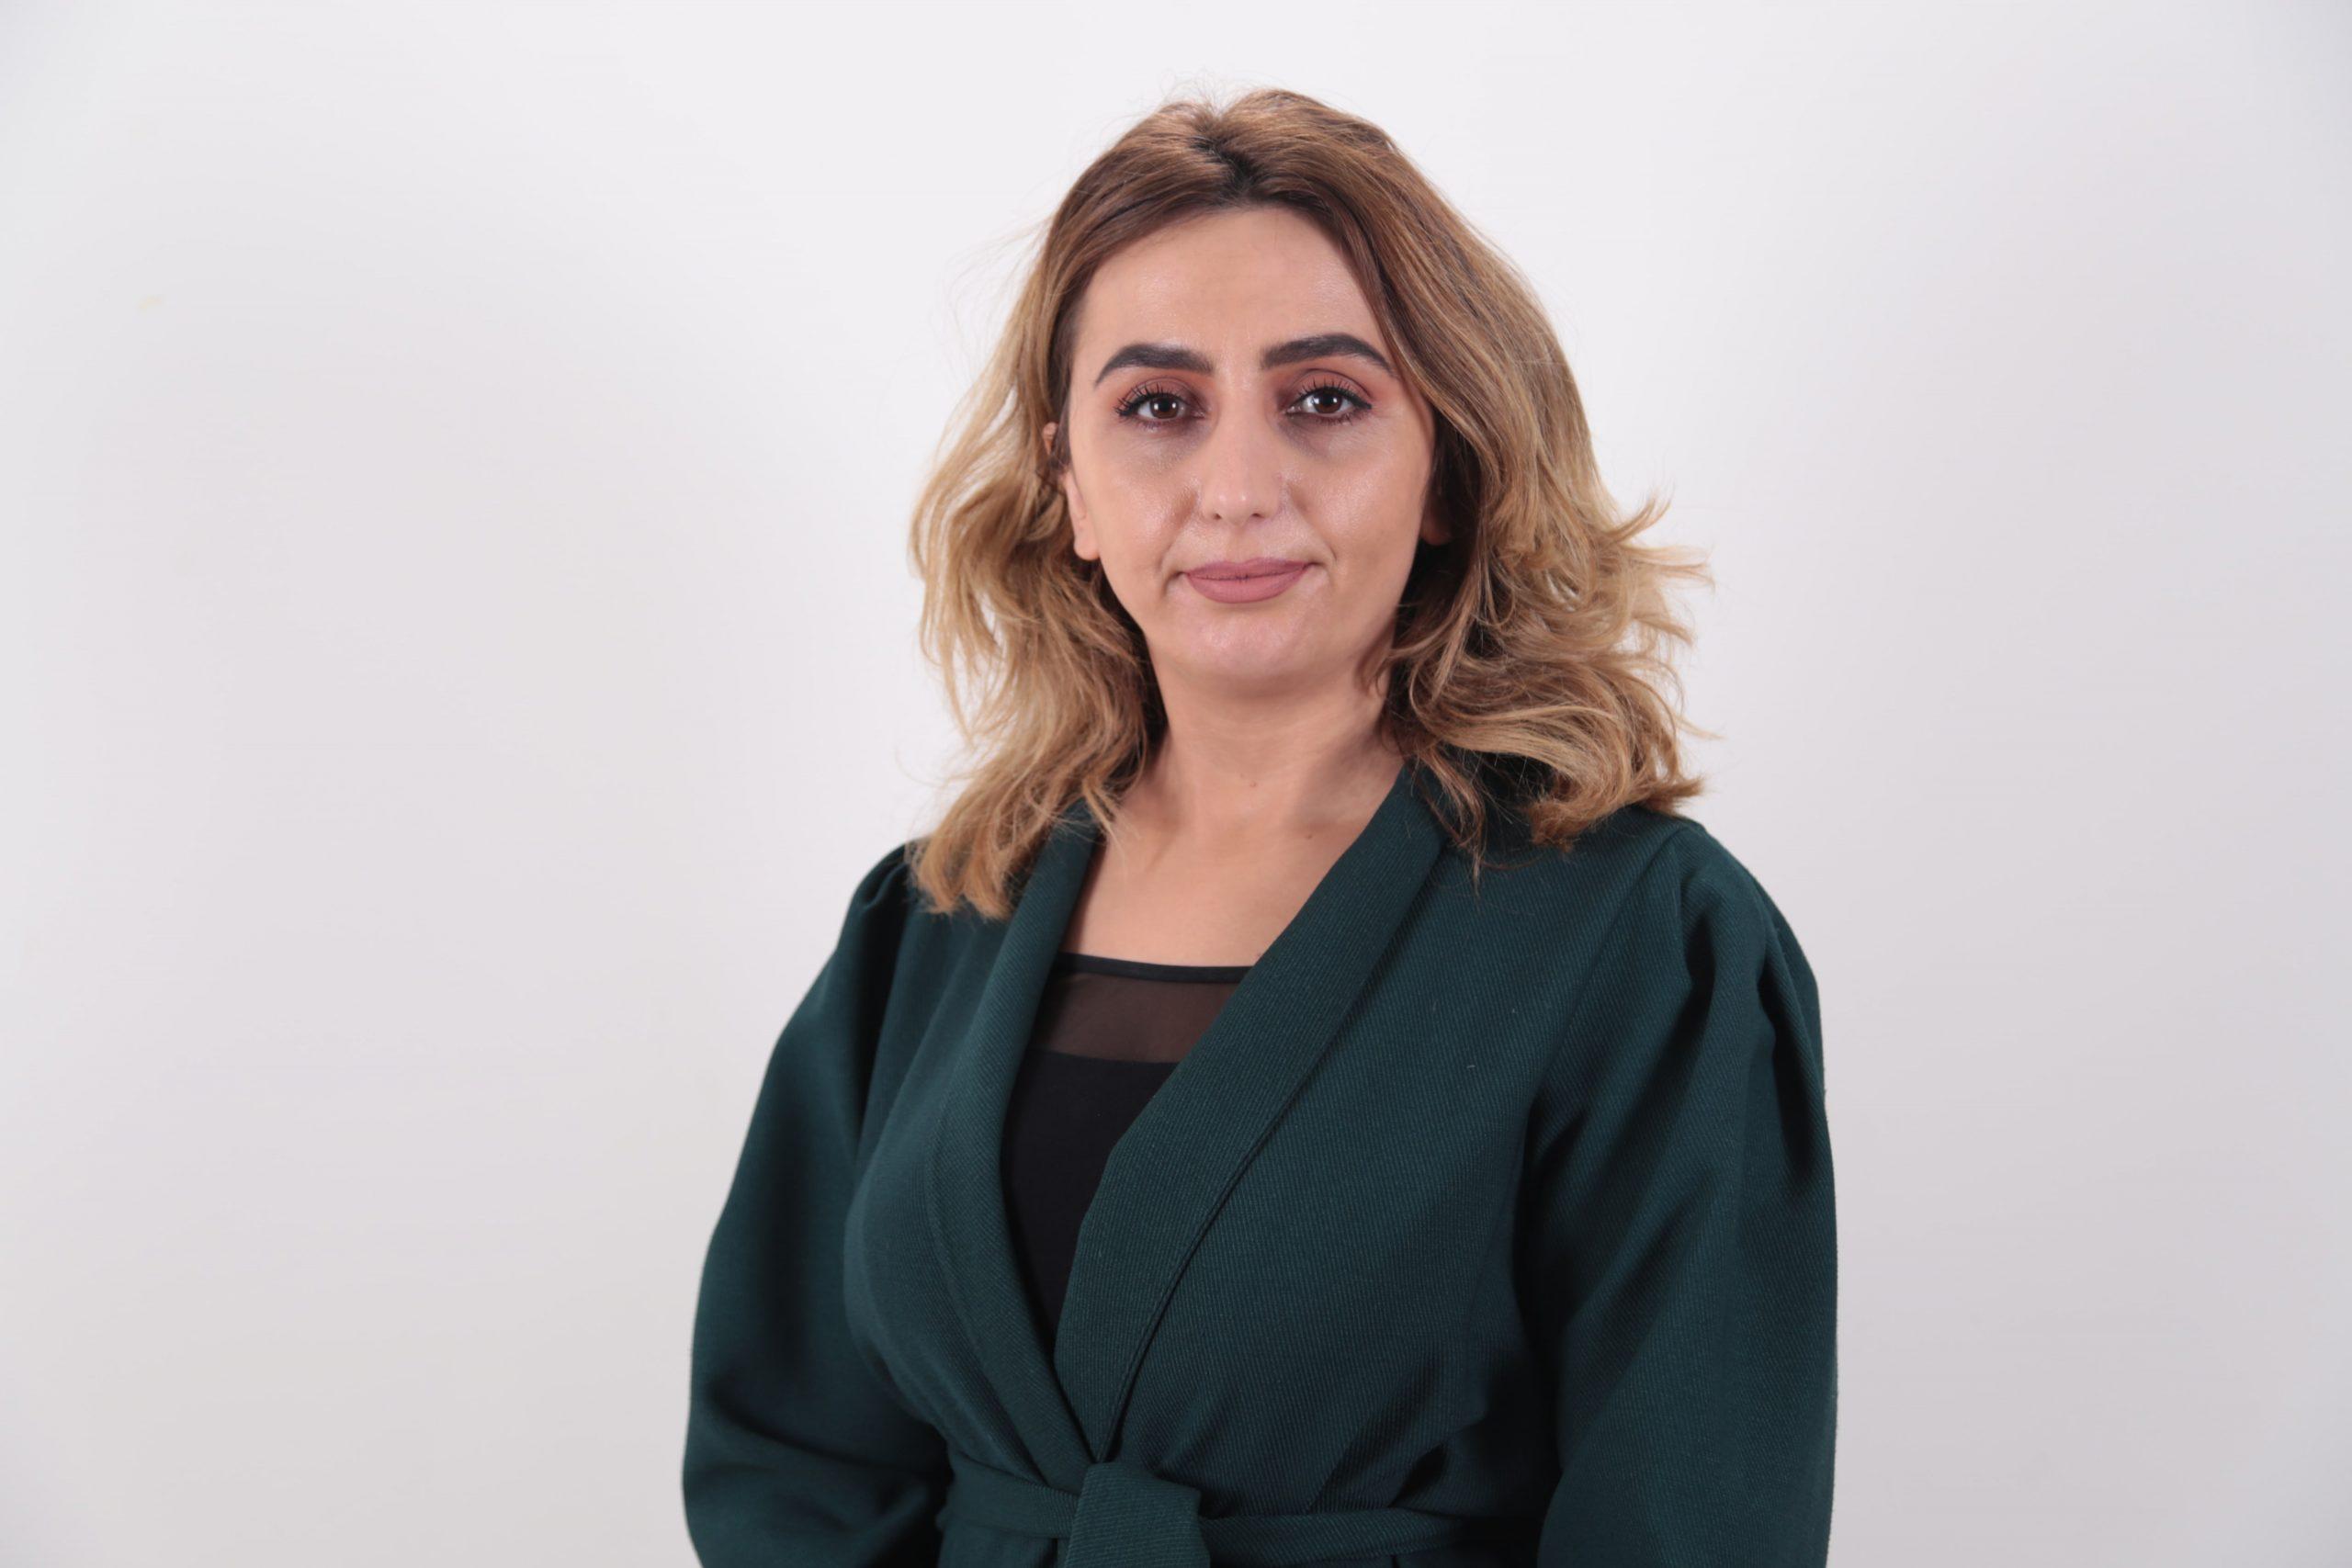 Arbenita Krasniqi